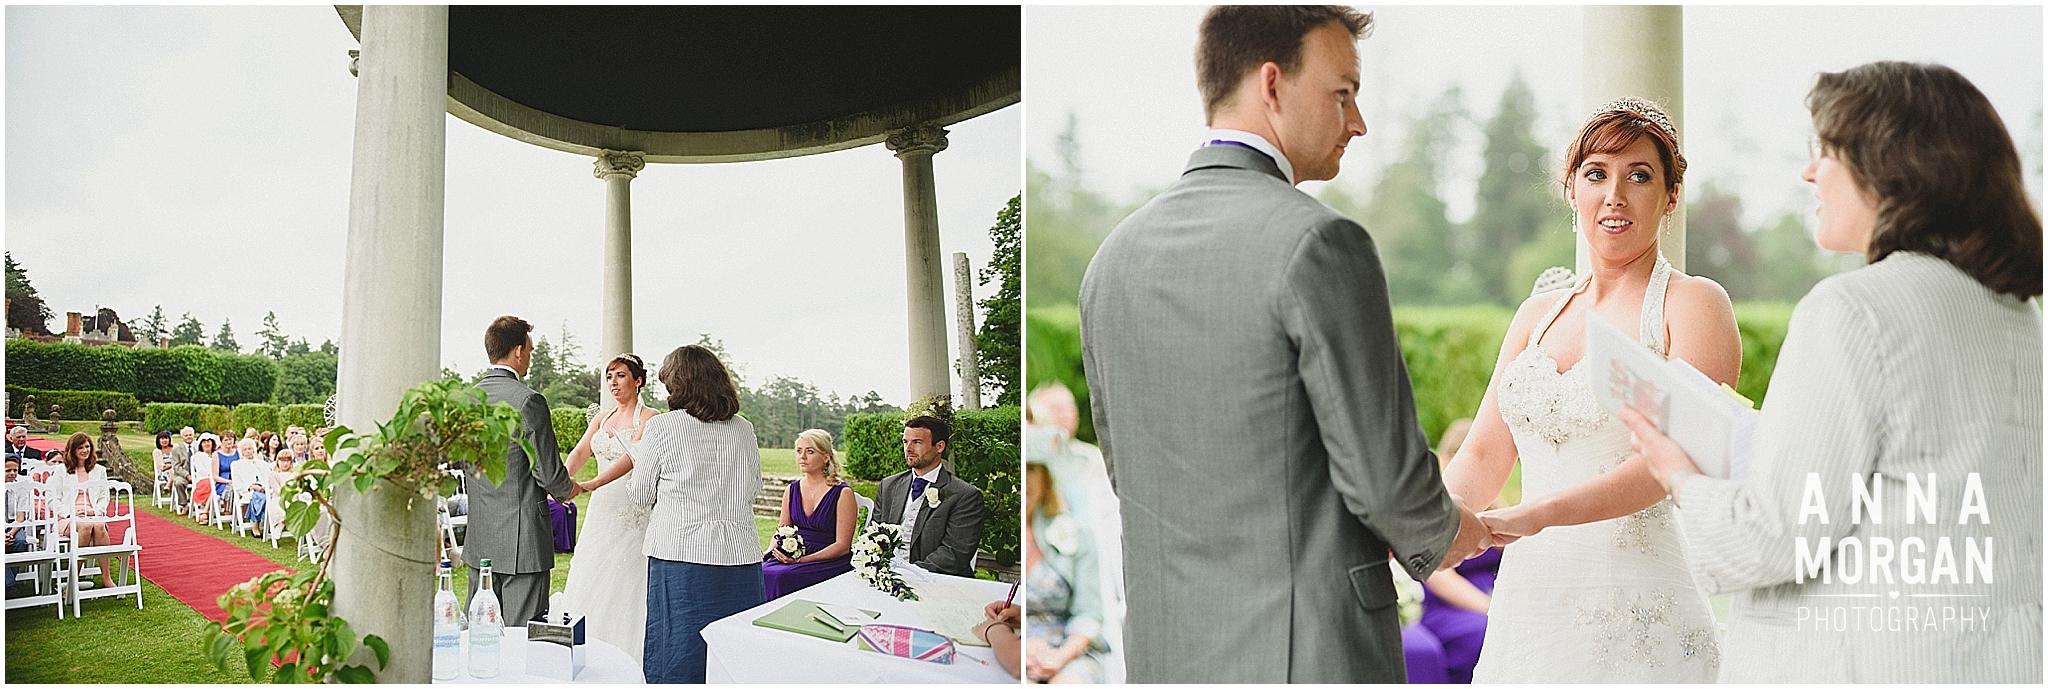 Frankie & Andy Rhinefield House Wedding-54